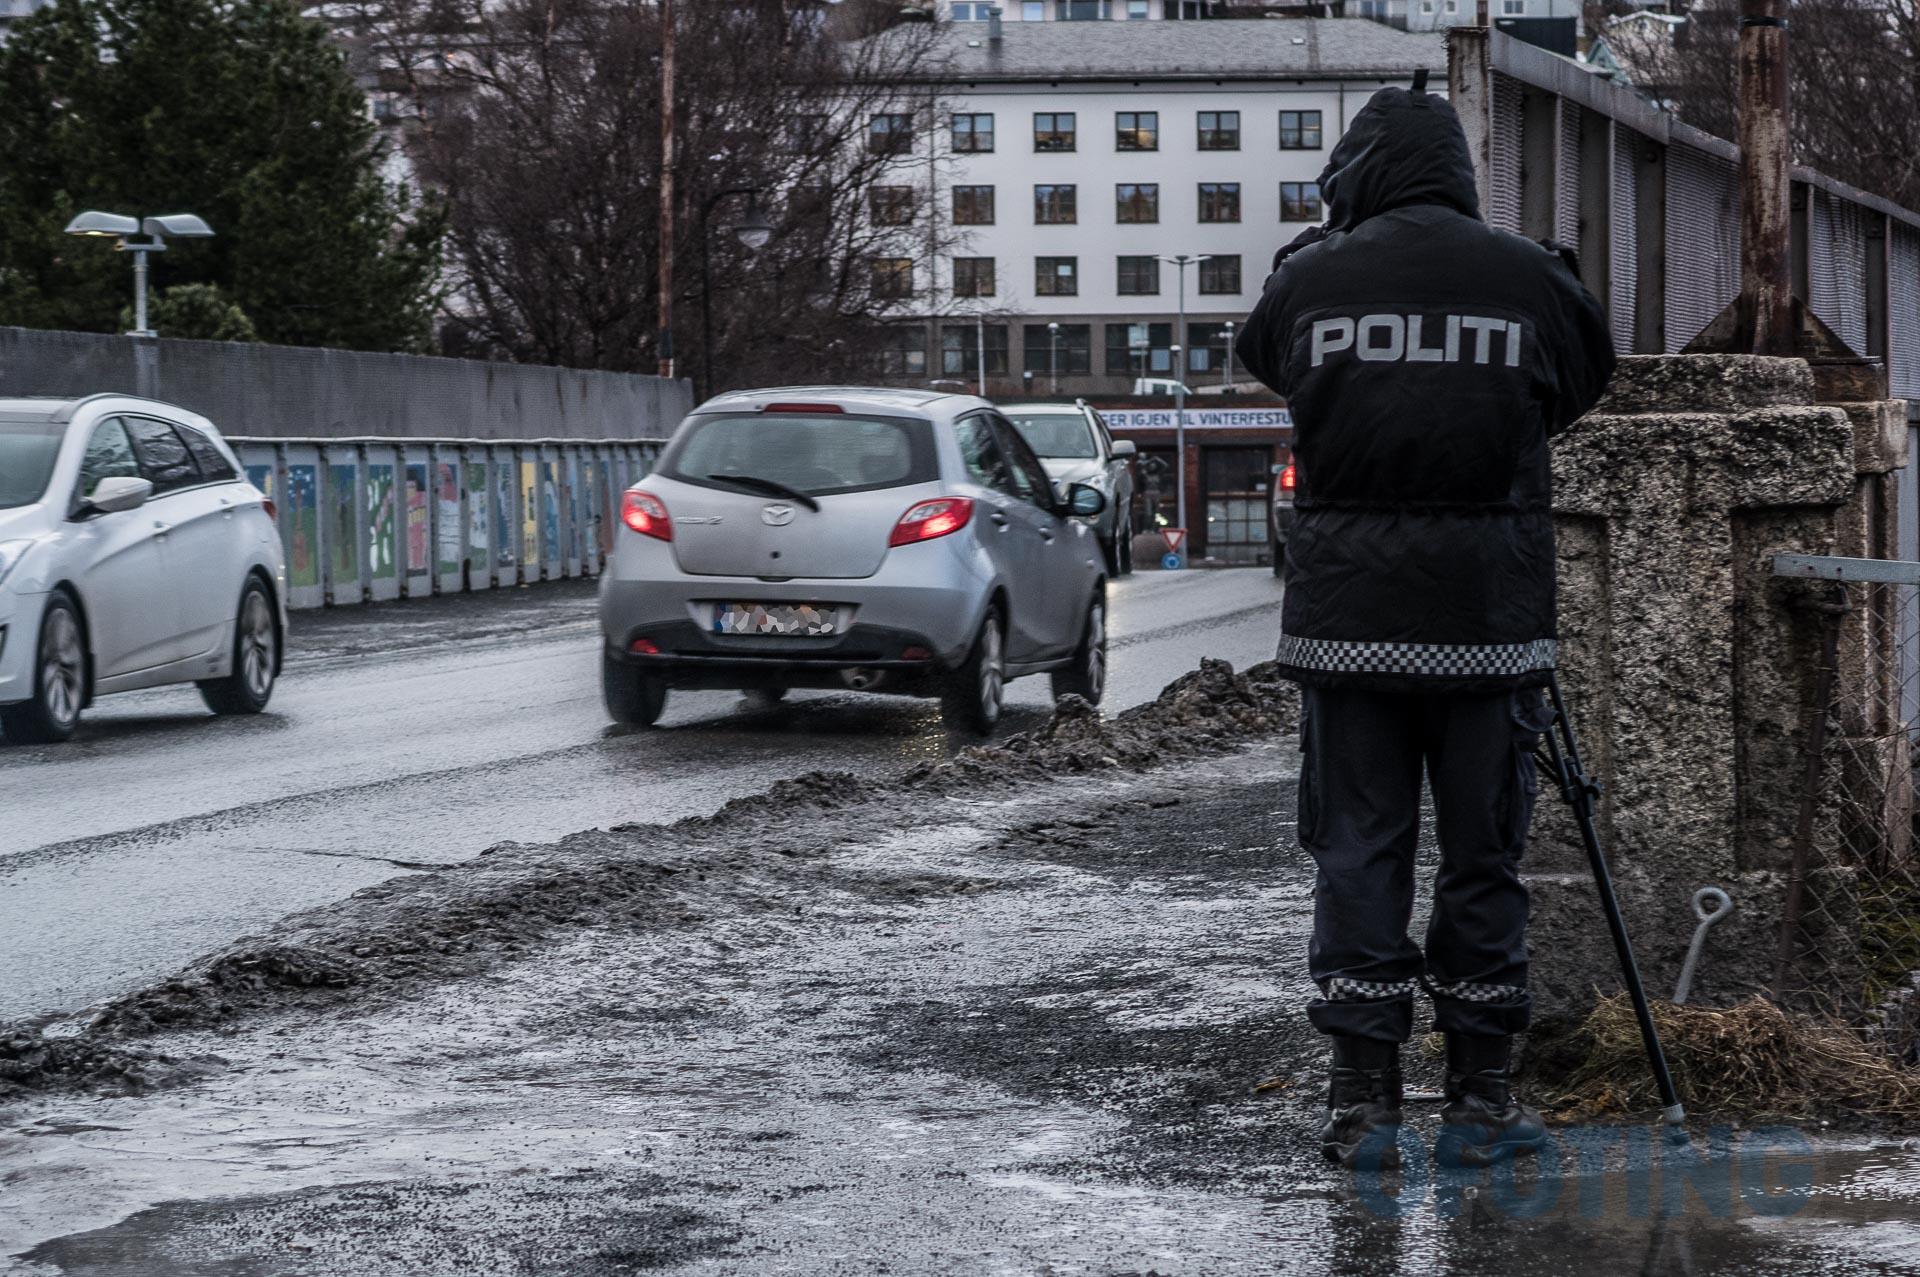 Politiet kontrollerer bilister i Narvik. (Illustrasjonsfoto: Robin Lund)